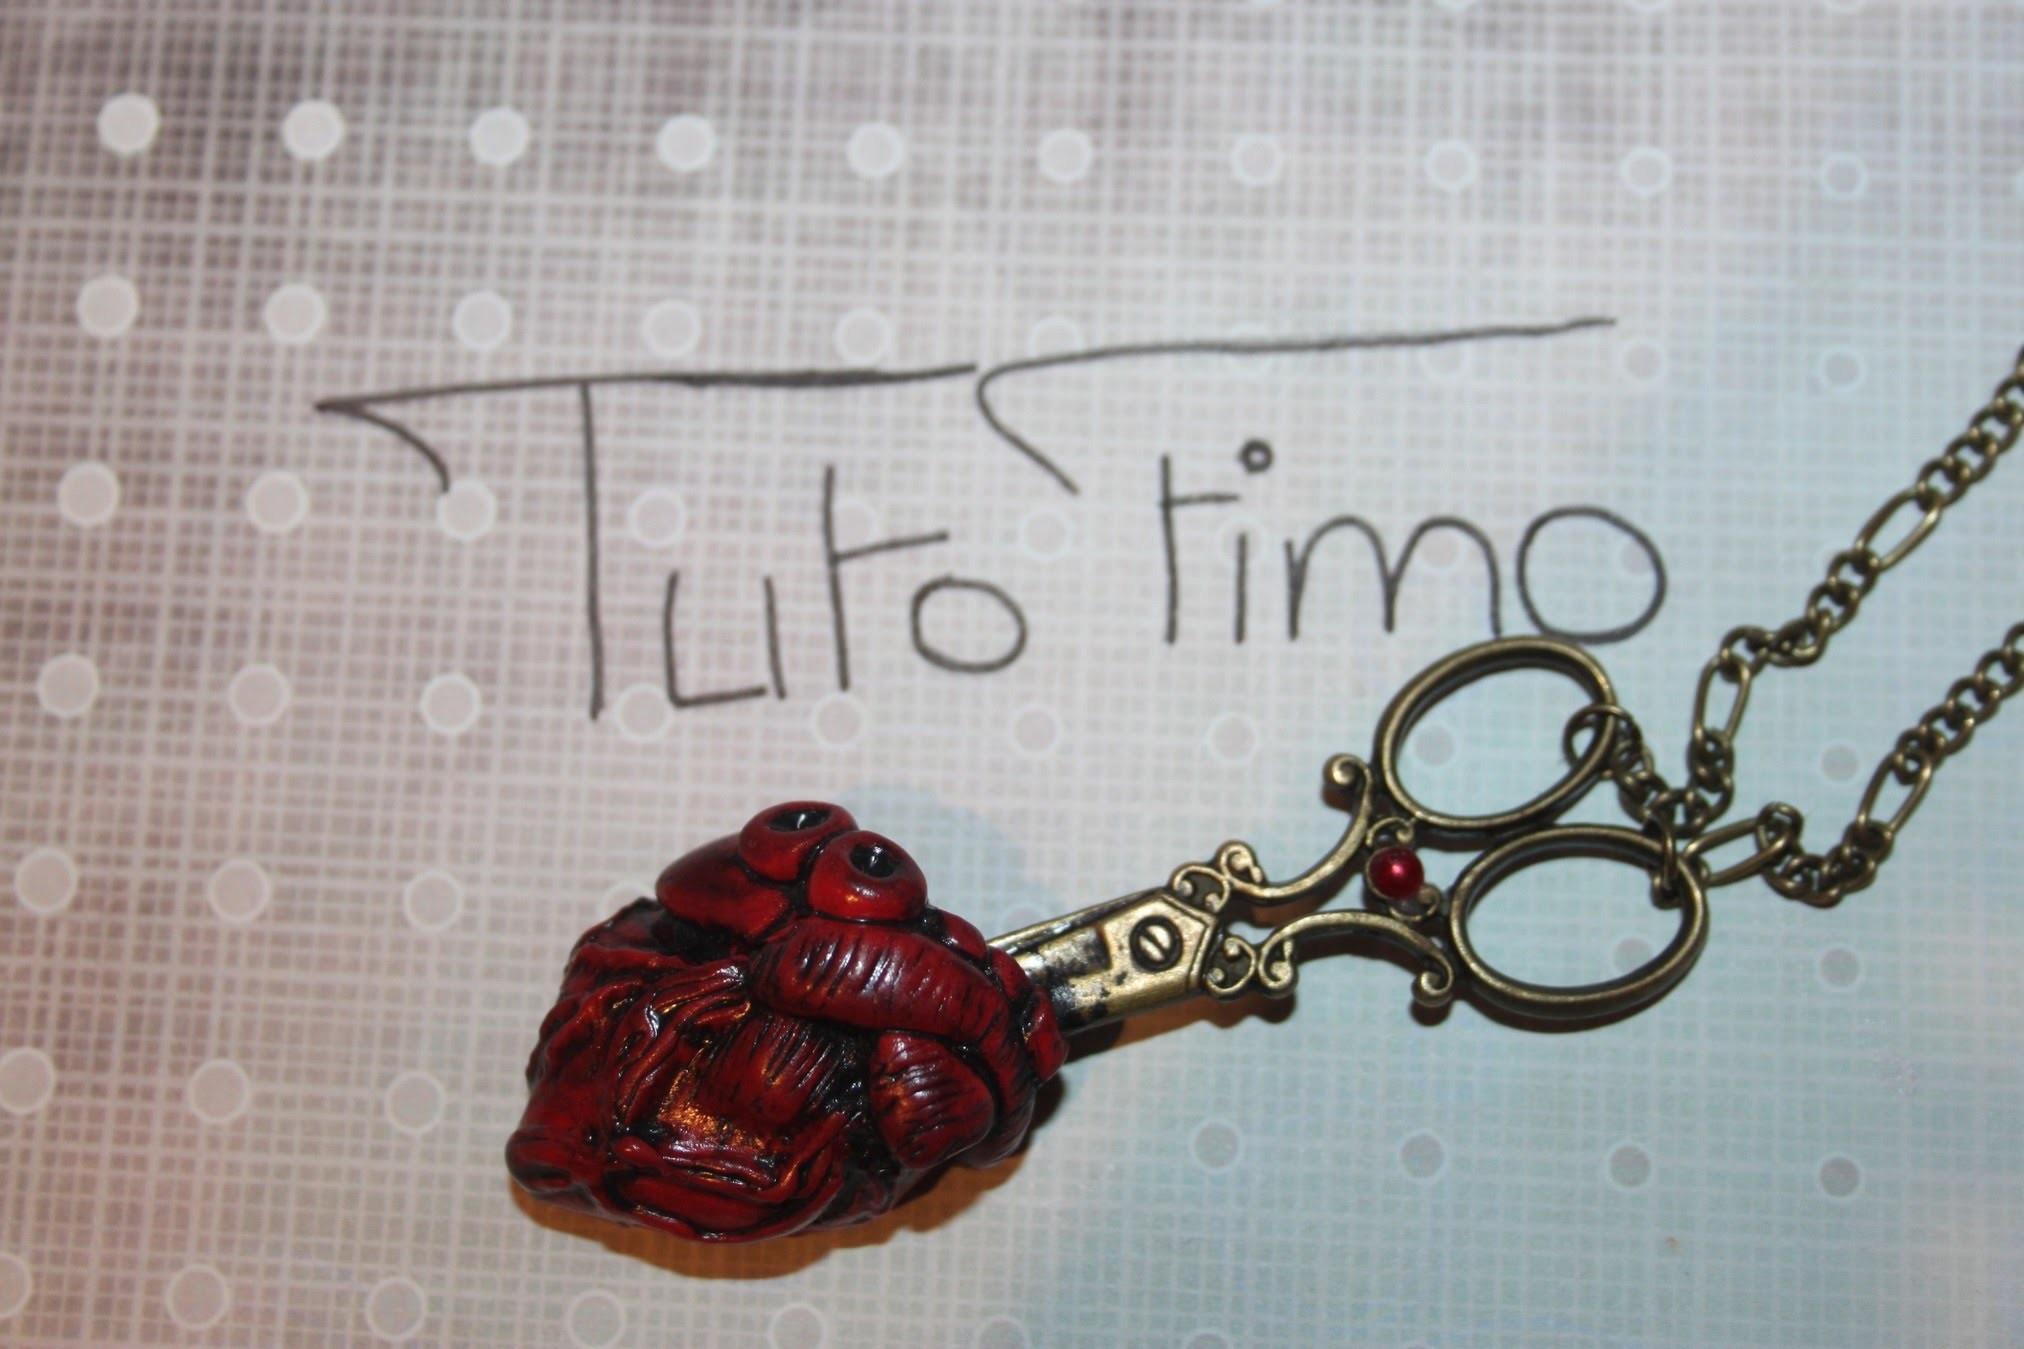 [♥✿ Tuto Fimo : Coeur humain ✿♥] ~ [♥✿ Polymer Clay Tutorial : Human Heart ✿♥]